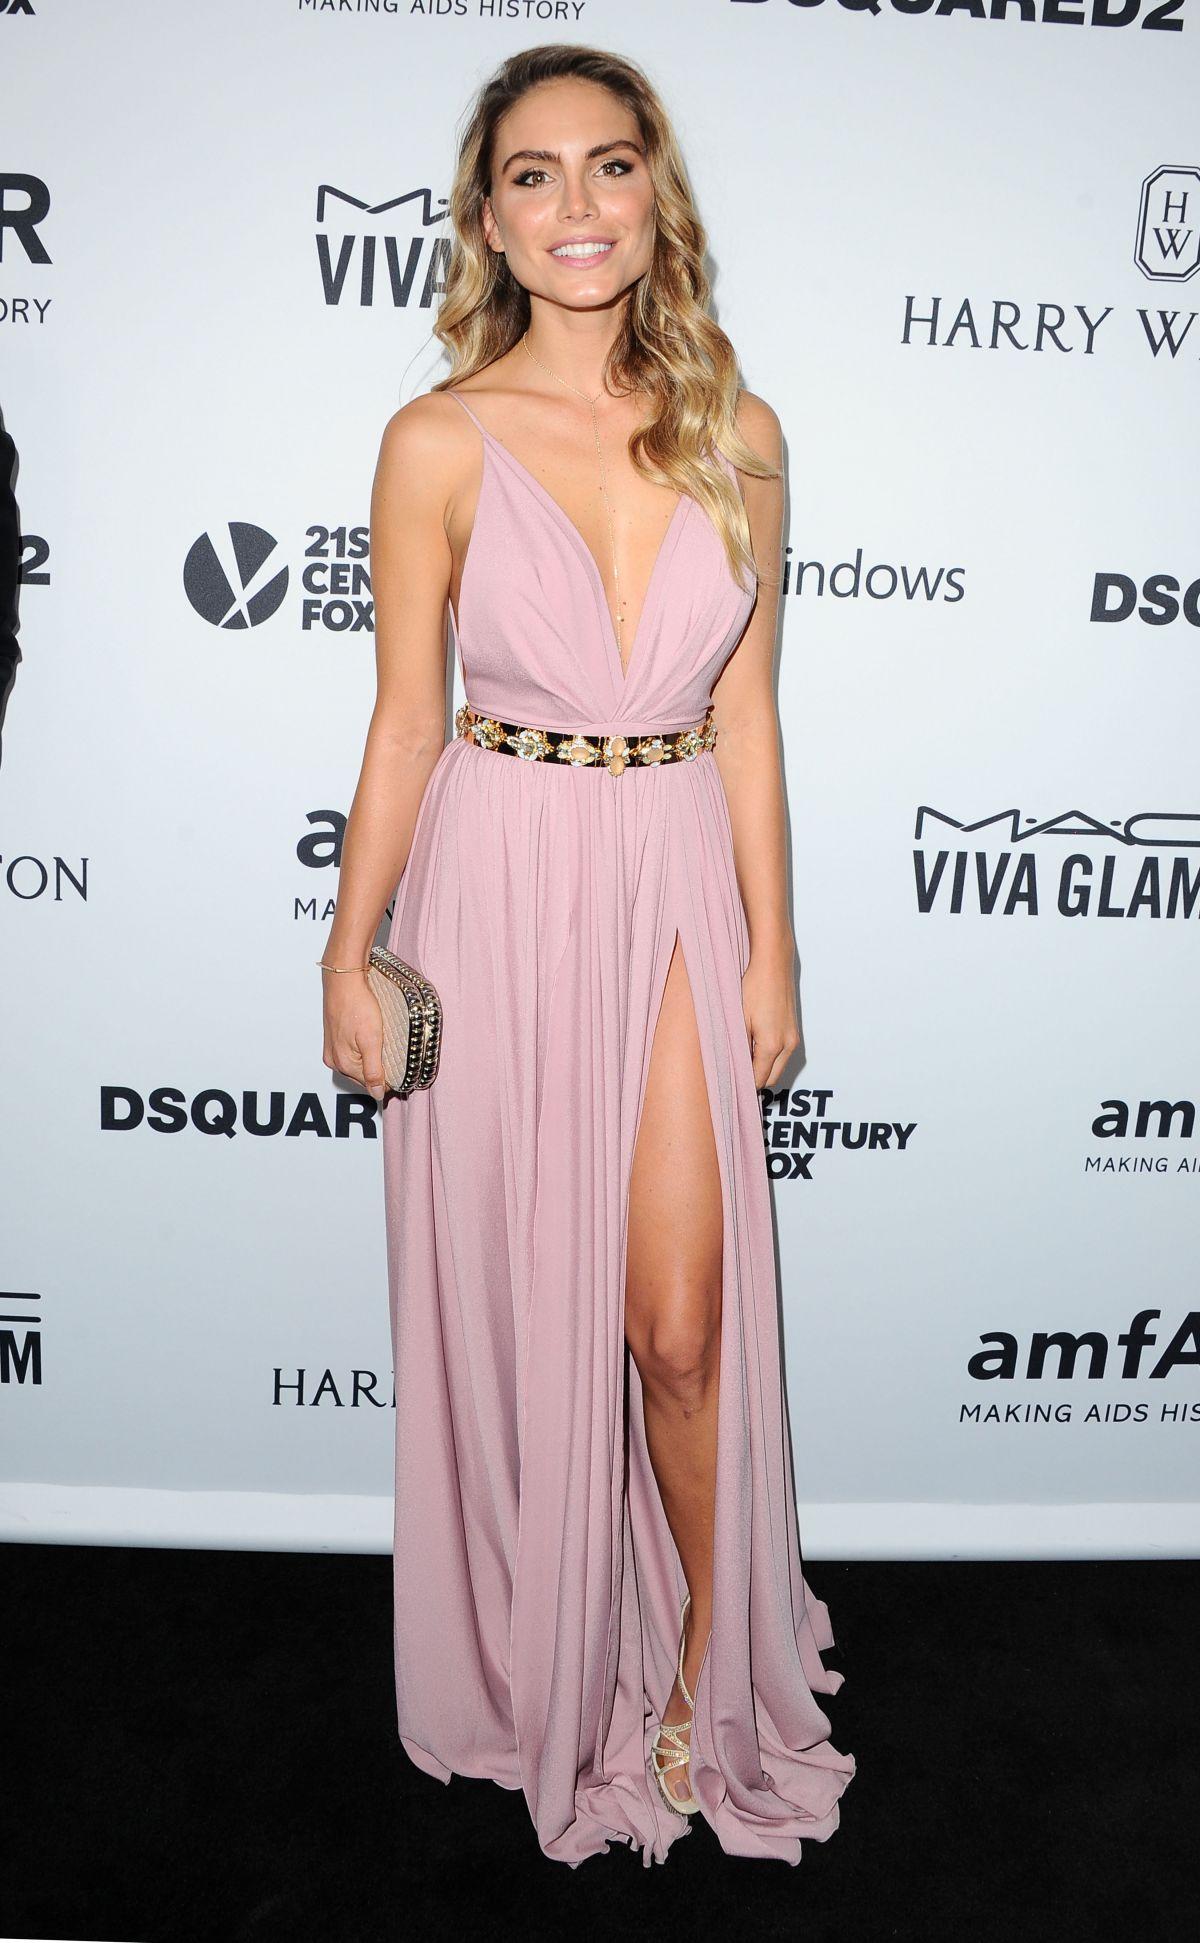 NINA SENICAR at amfAR's Inspiration Gala in Hollywood 10/29/2015